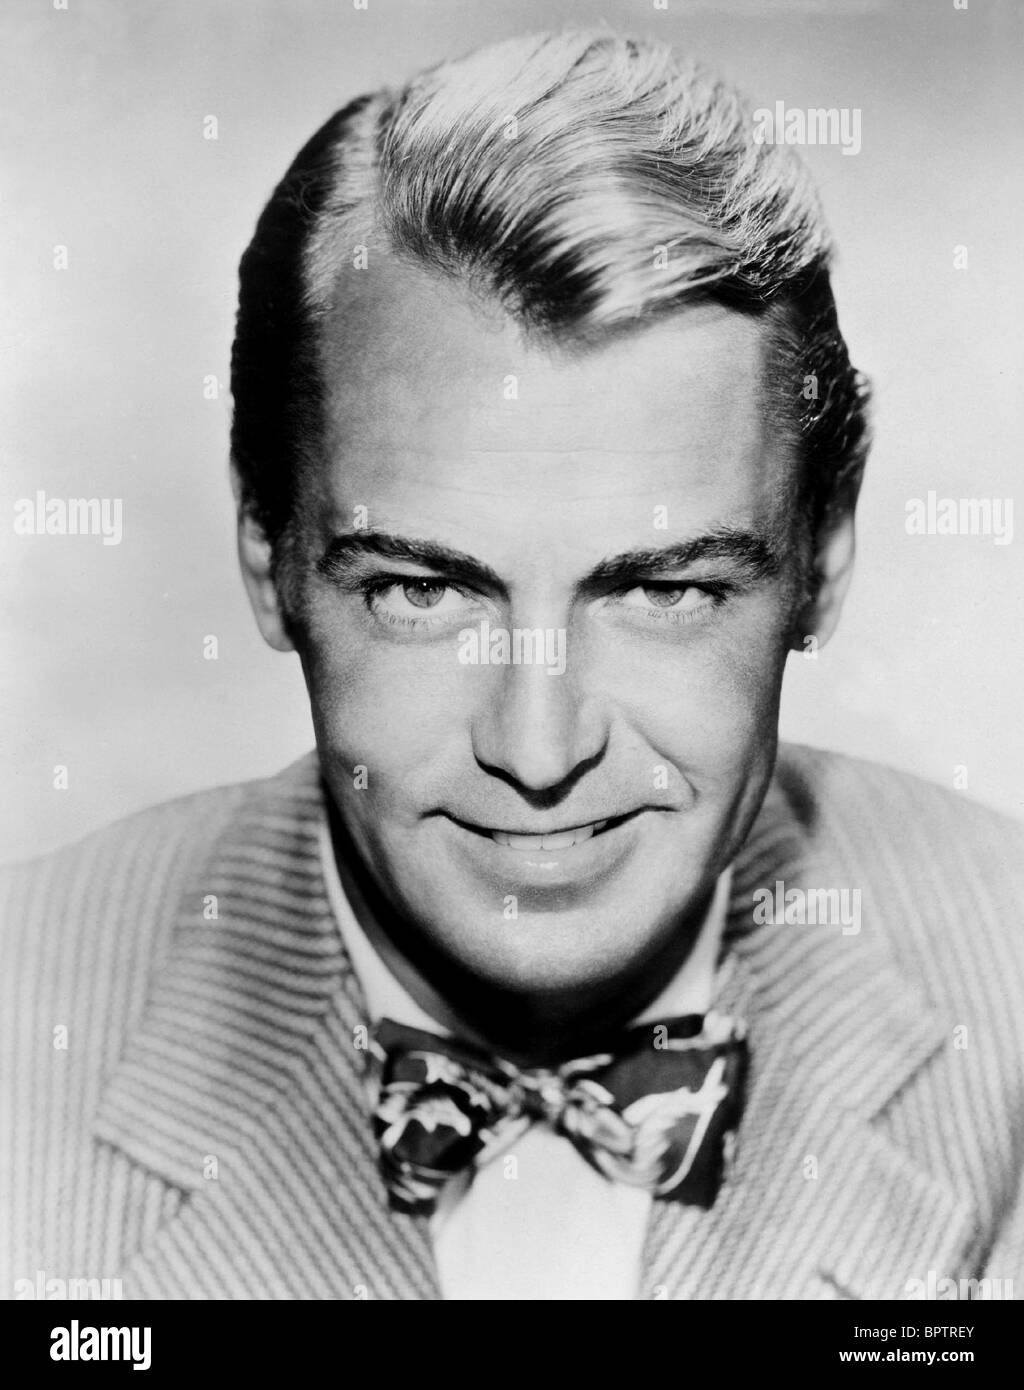 ALAN LADD ACTOR (1951) - Stock Image